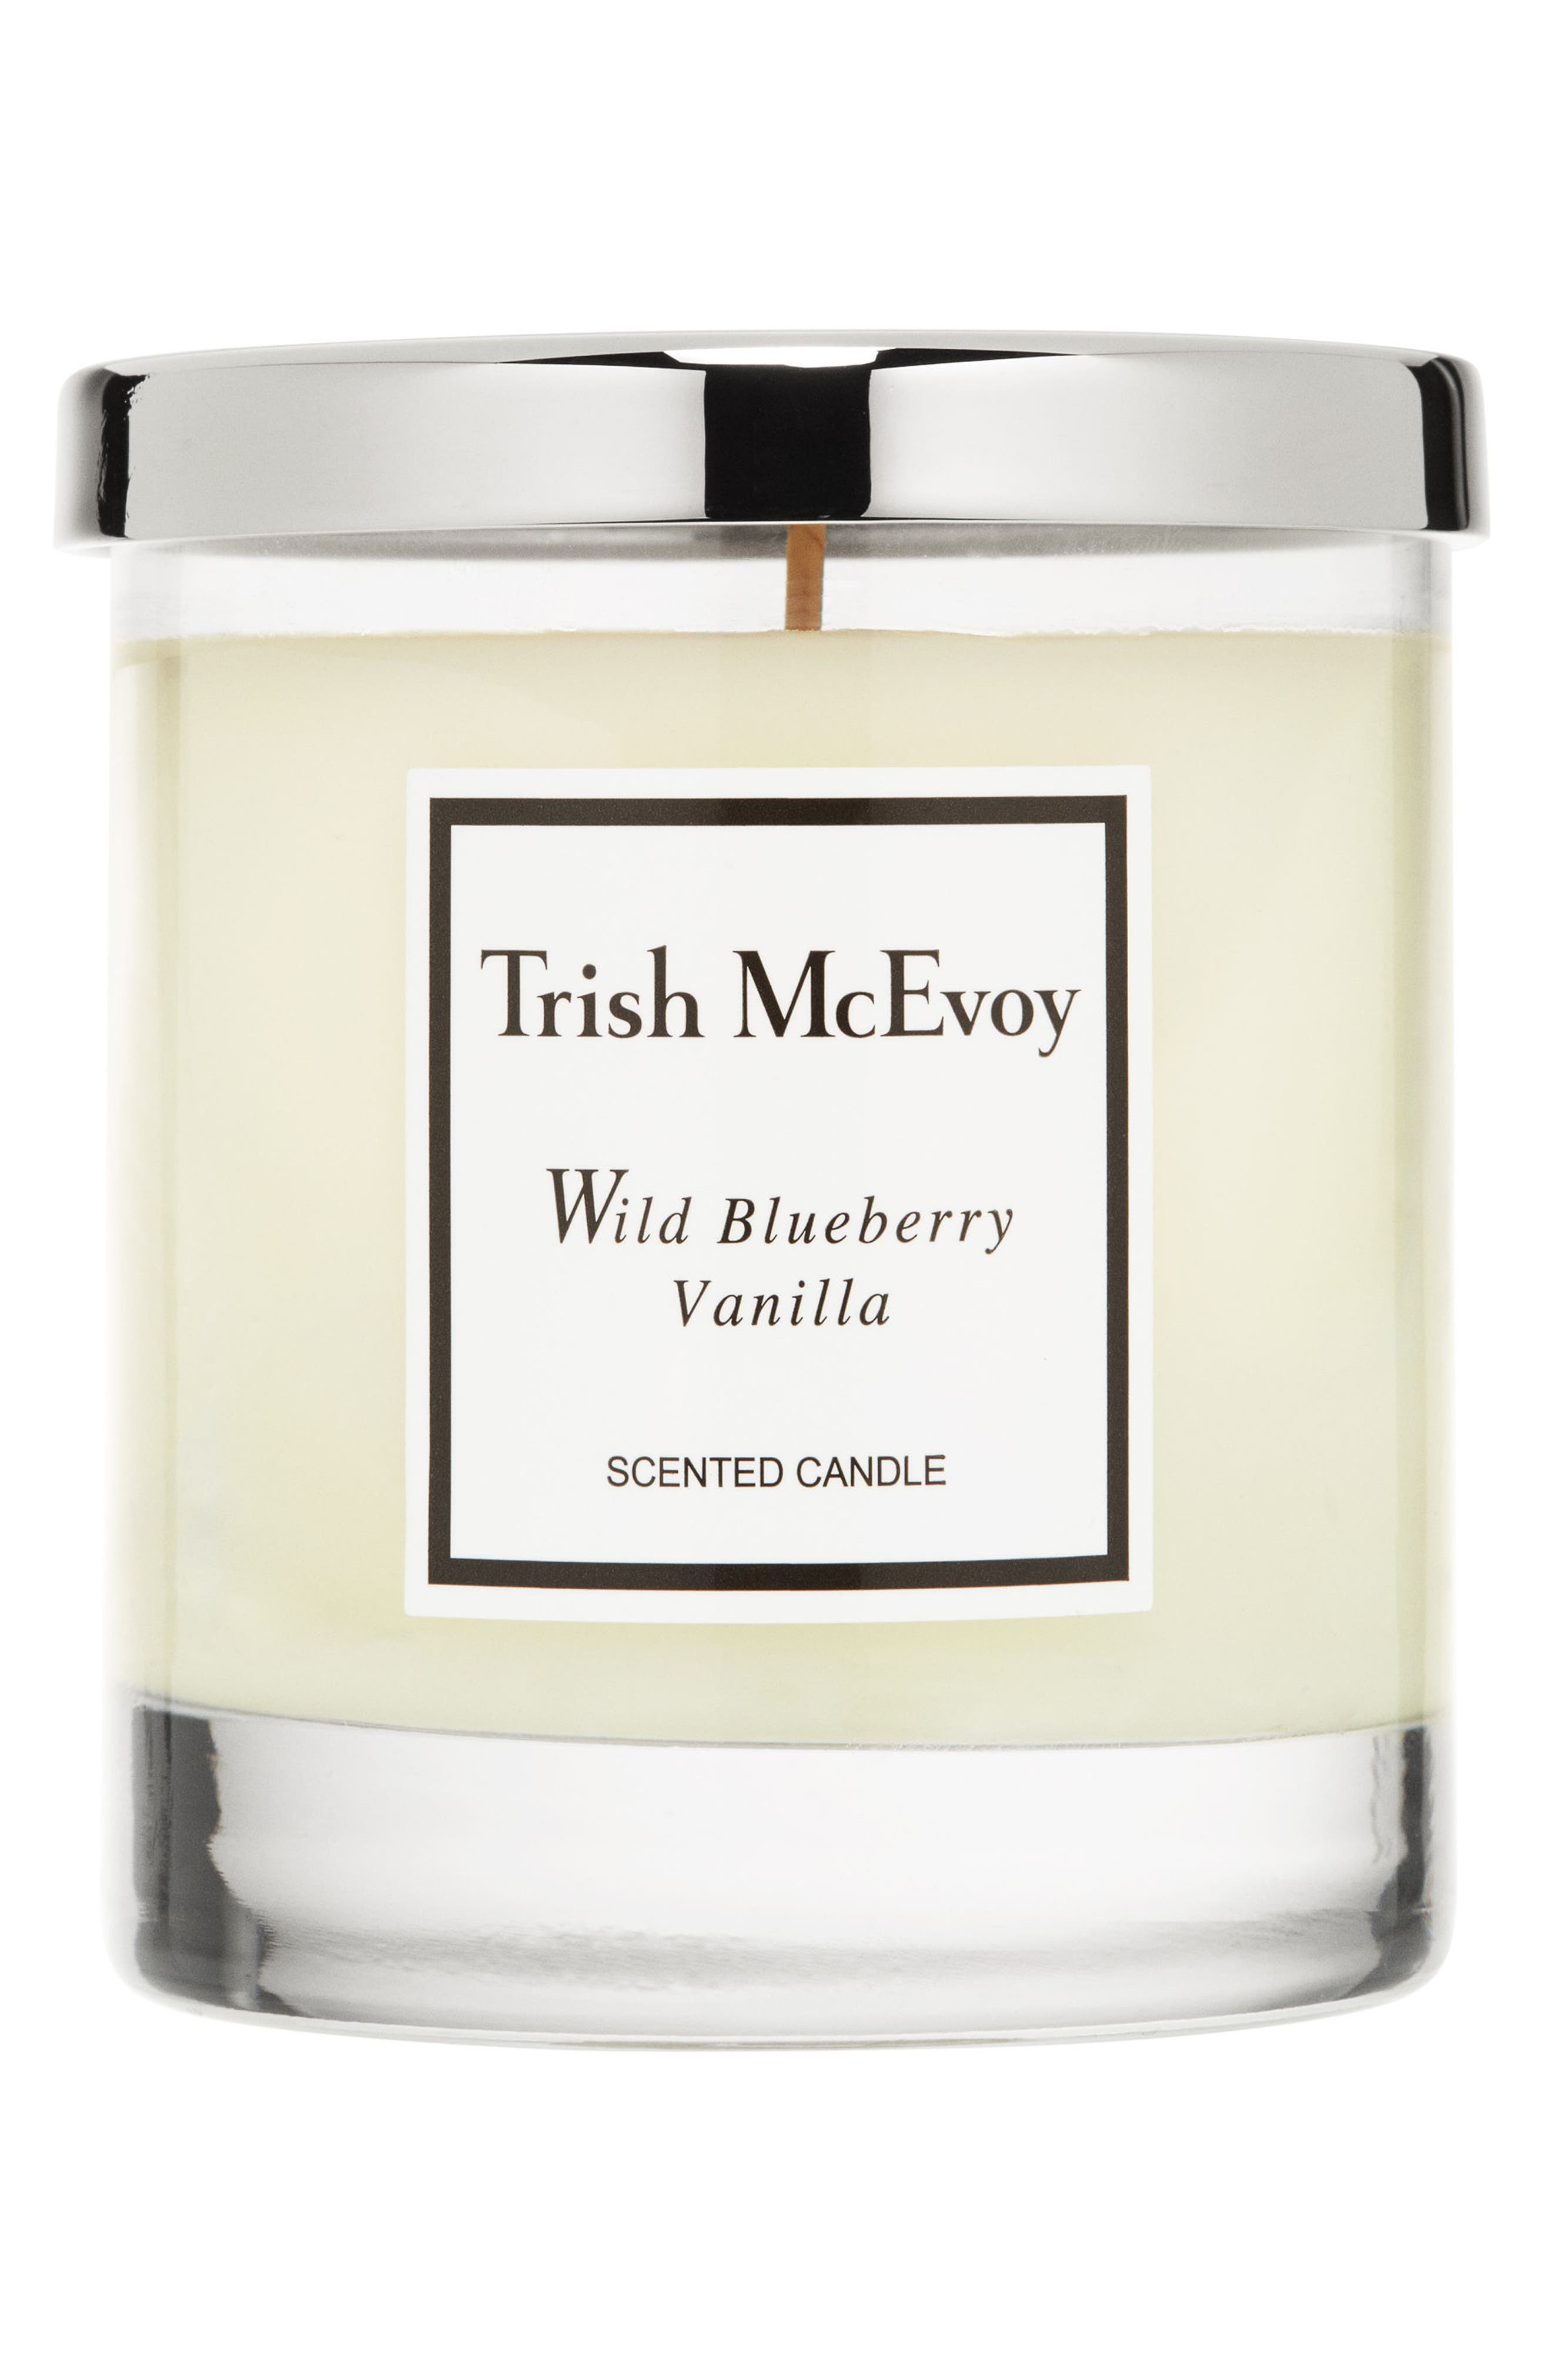 Trish McEvoy Wild Blueberry Vanilla Votive Candle